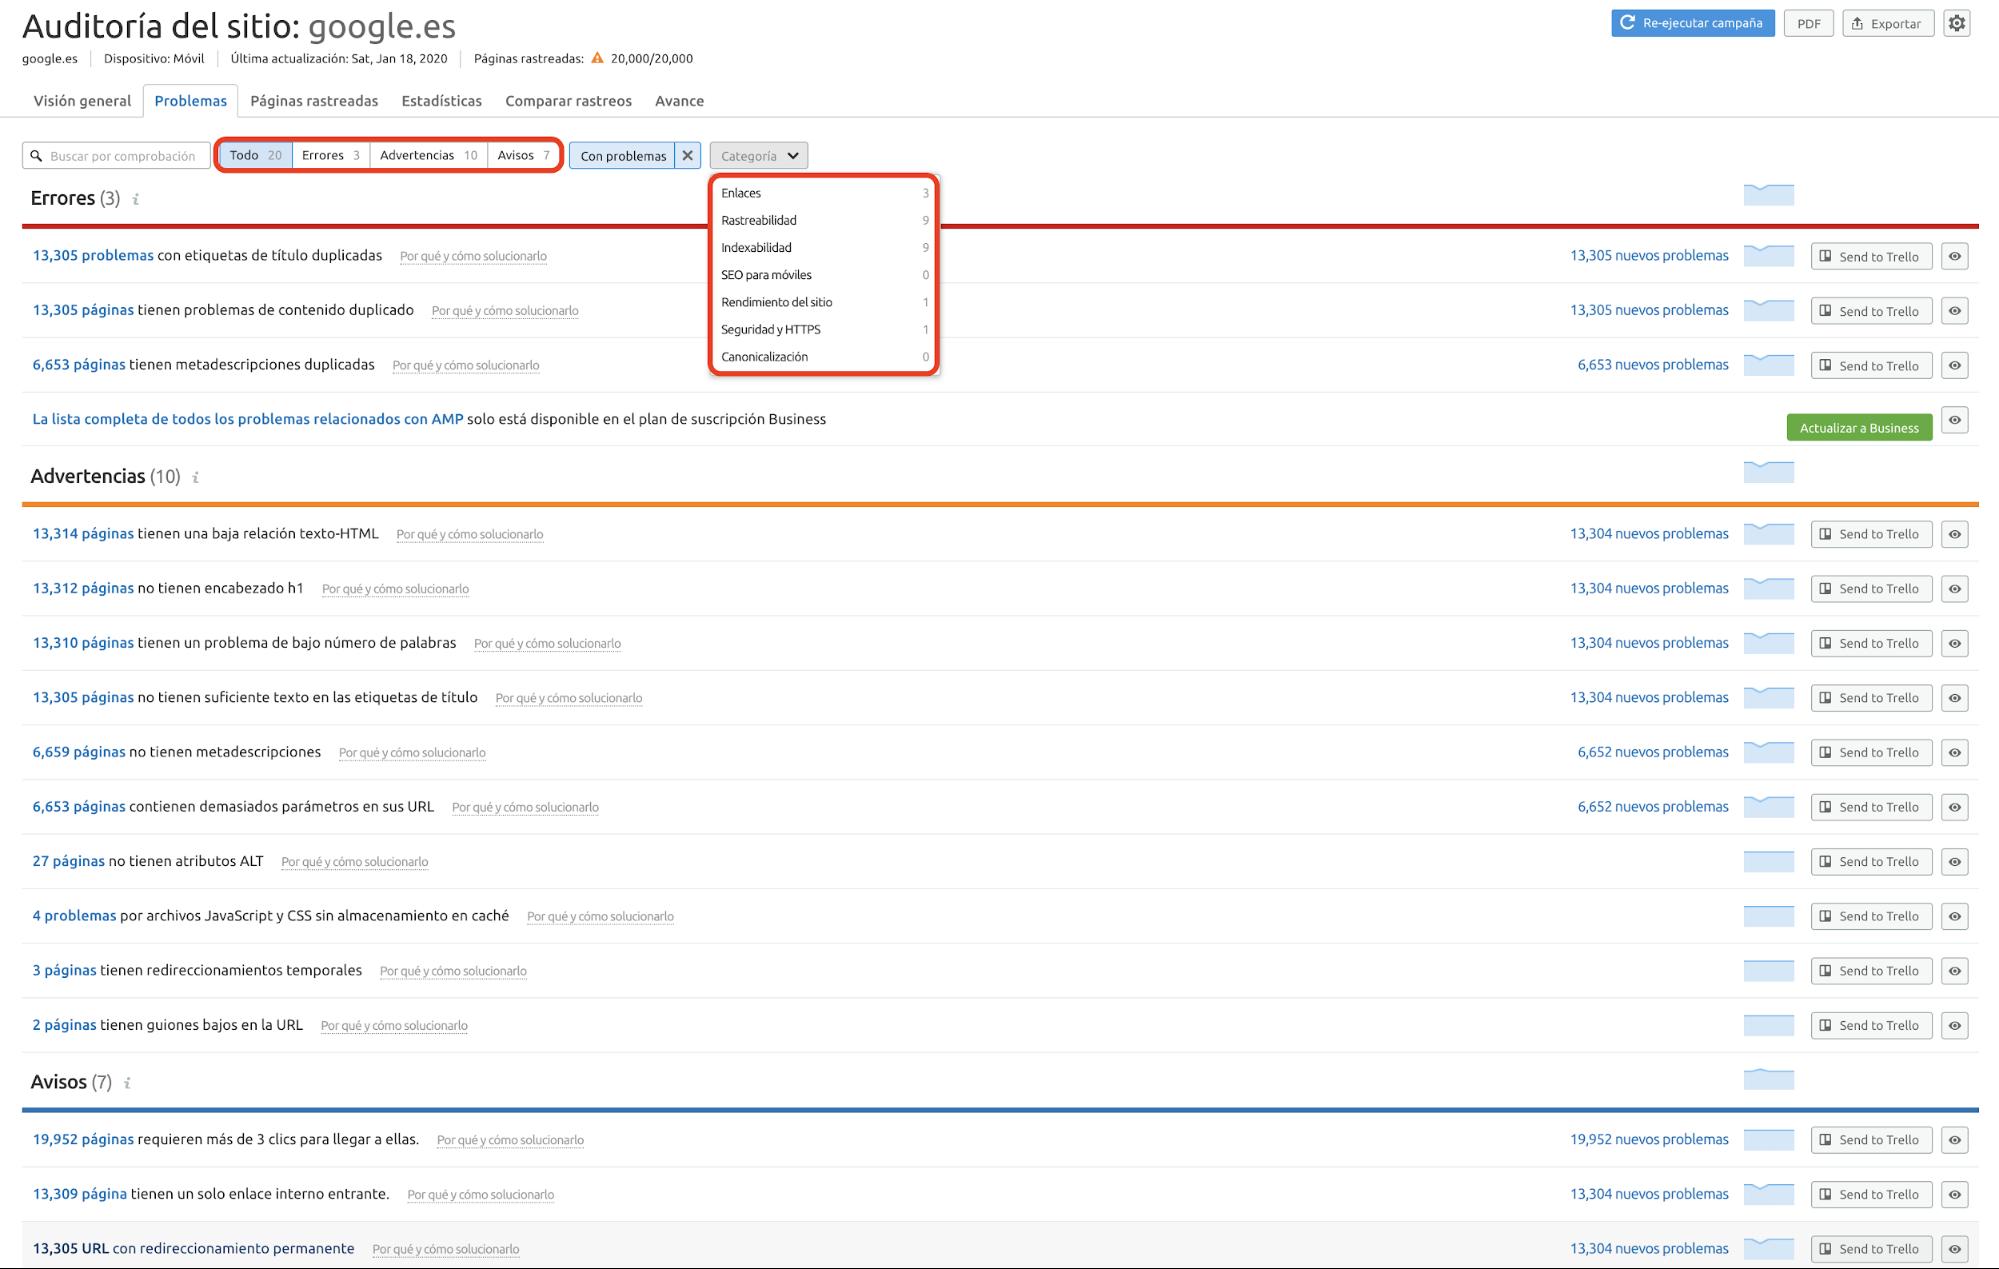 Auditoría SEO - Issues Google